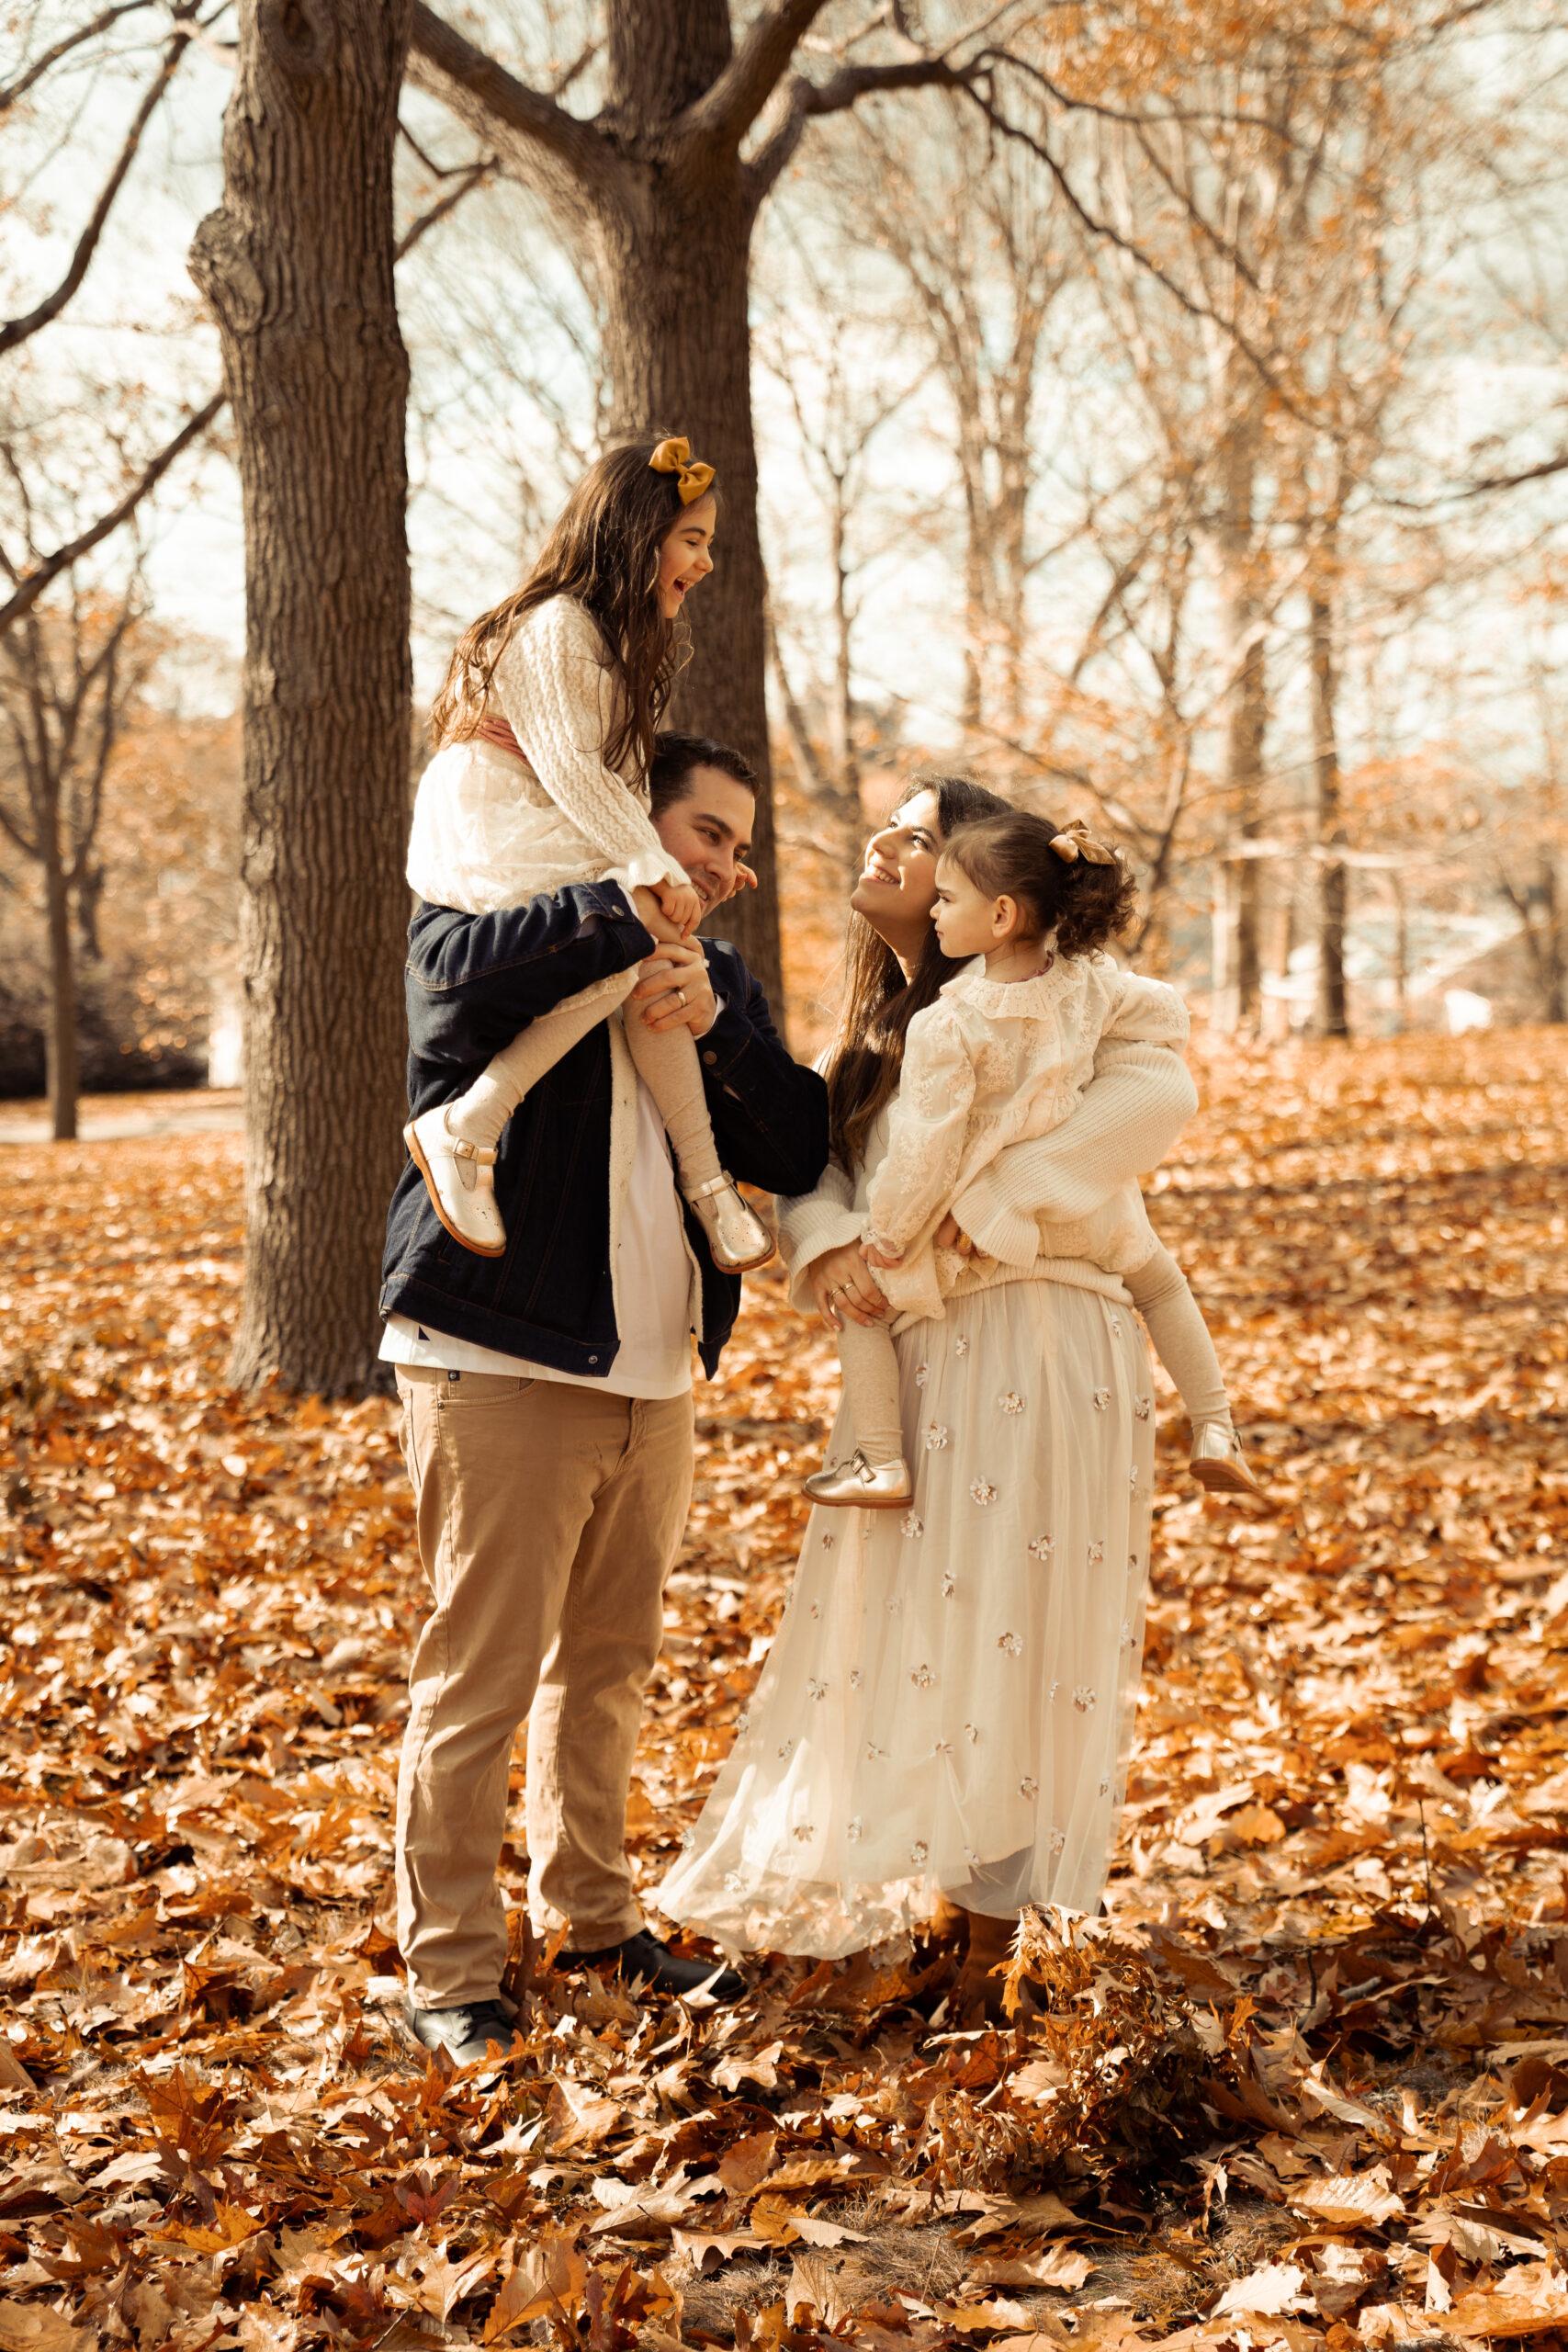 Our Annual Holiday Family Photos + A Thank You | @glitterinclexi | GLITTERINC.COM